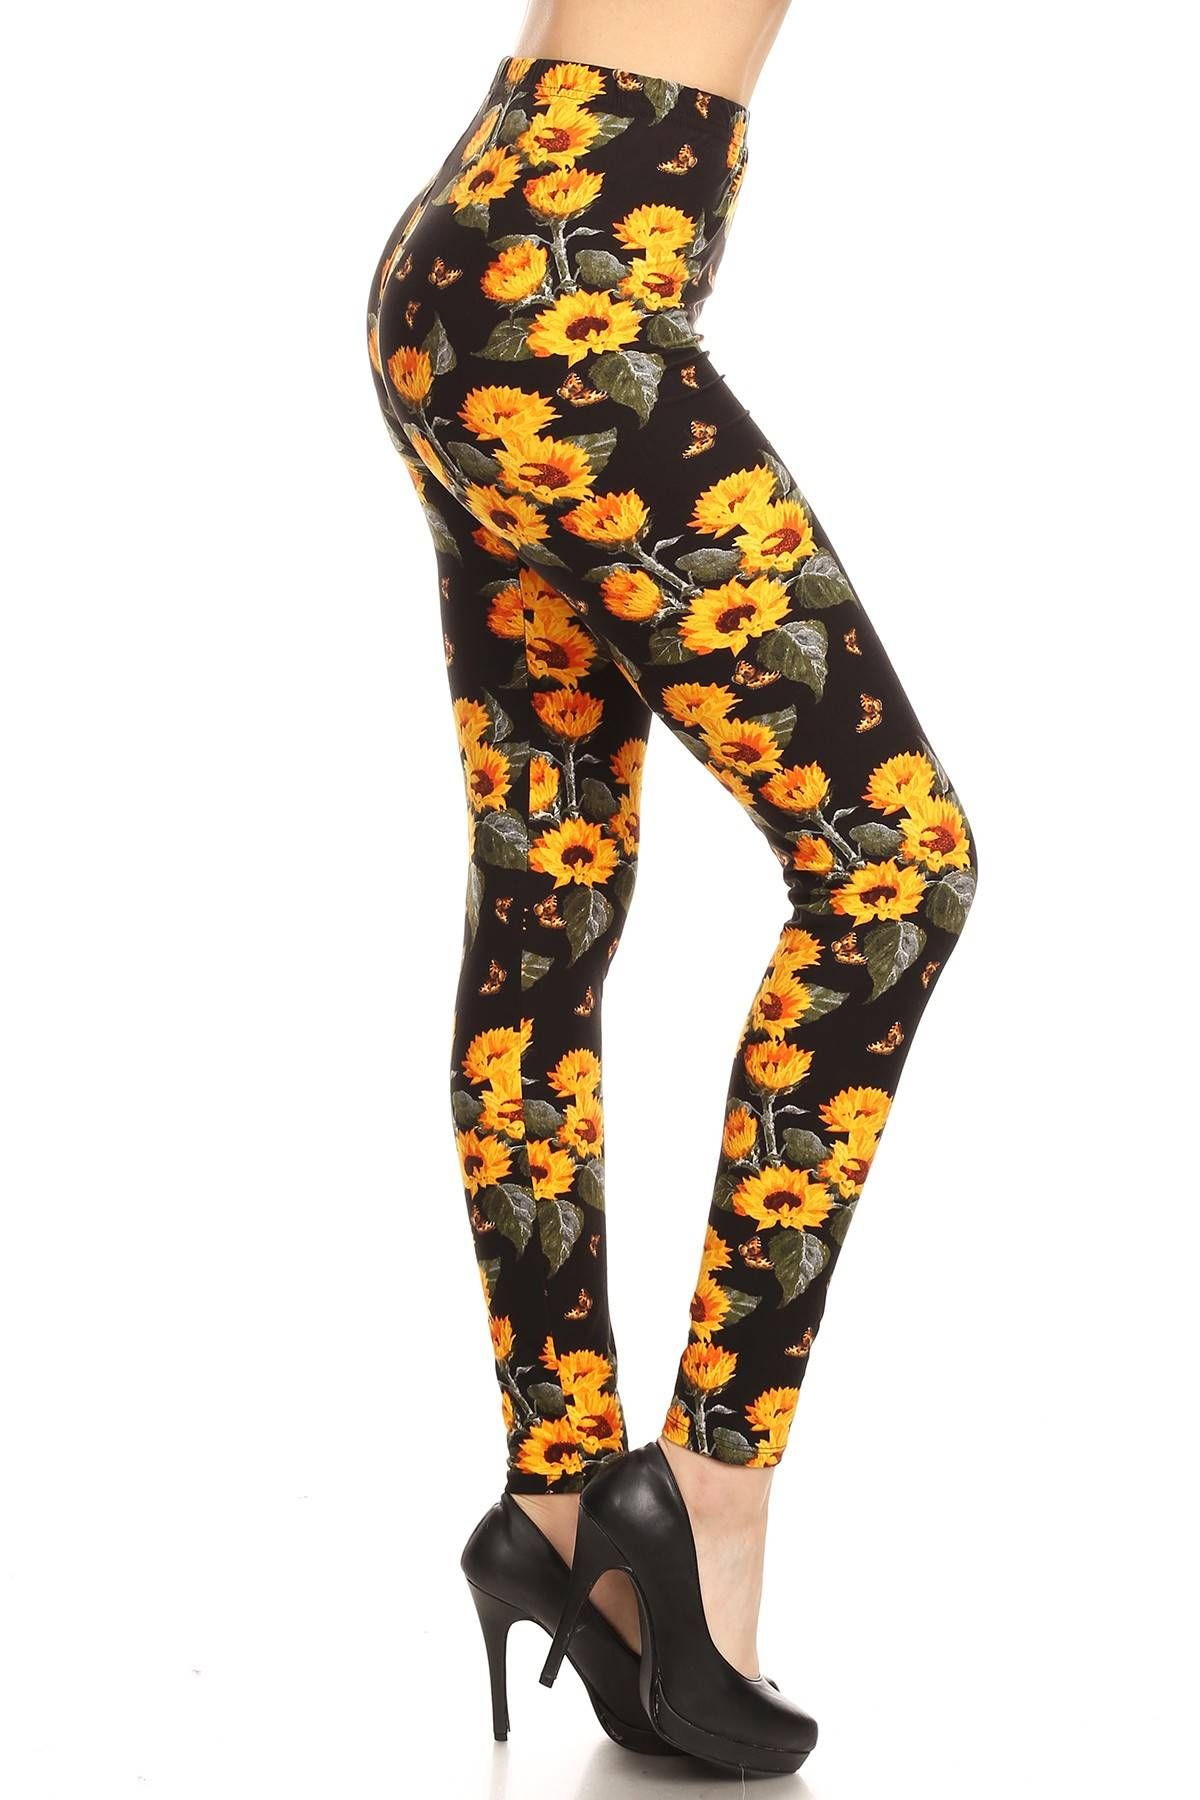 10a7444fb206d The Summer Splendor - OS #sunflowers #butterfly #leggings #spring ...